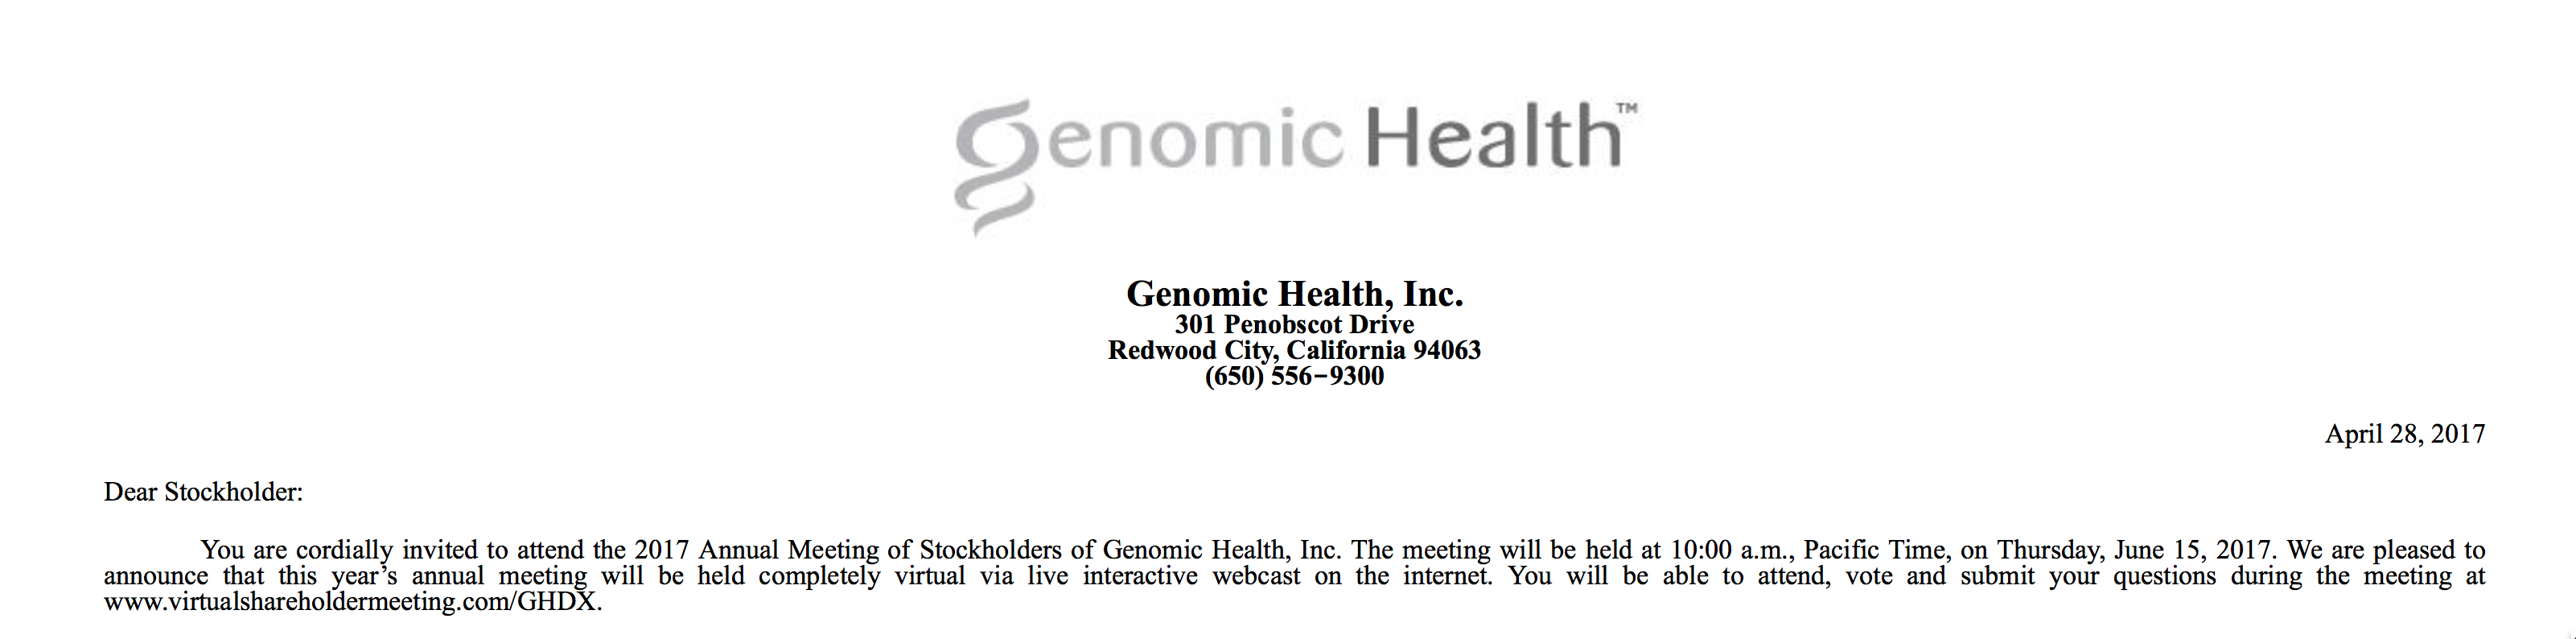 Genomic Health Proxy Voting Guide